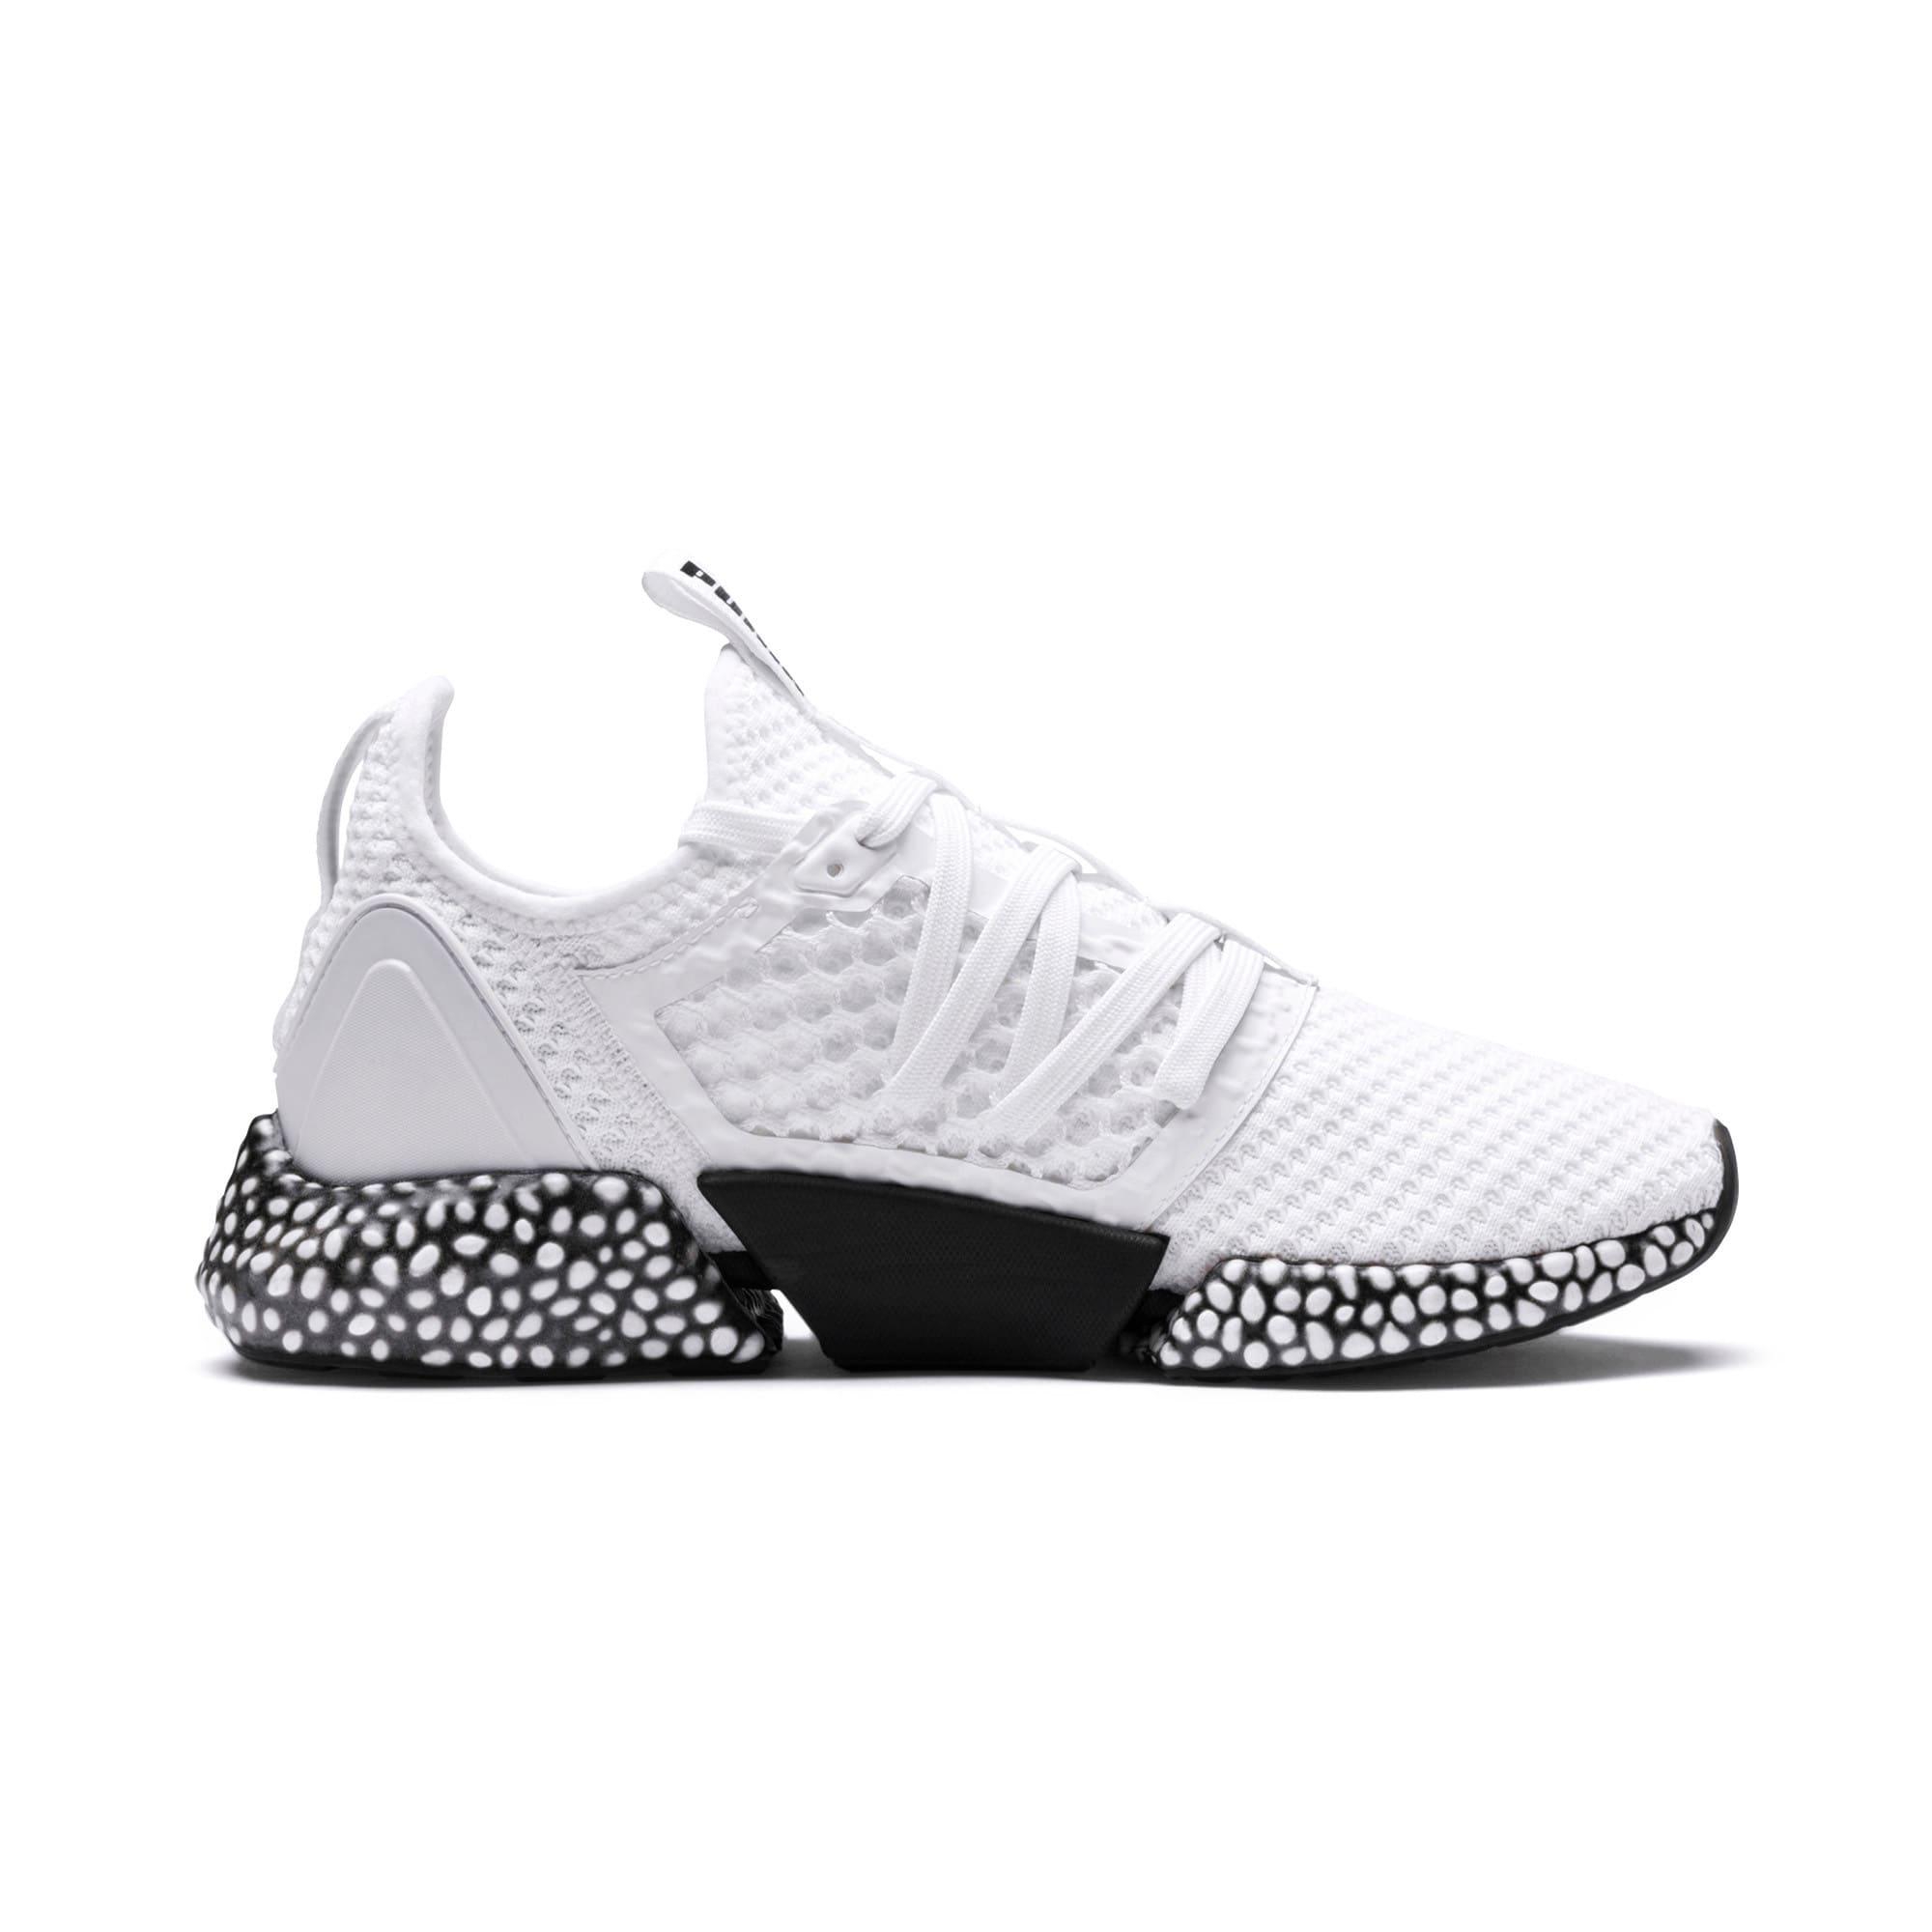 Thumbnail 5 of Hybrid Rocket NETFIT Men's Training Shoes, Puma White-Puma Black, medium